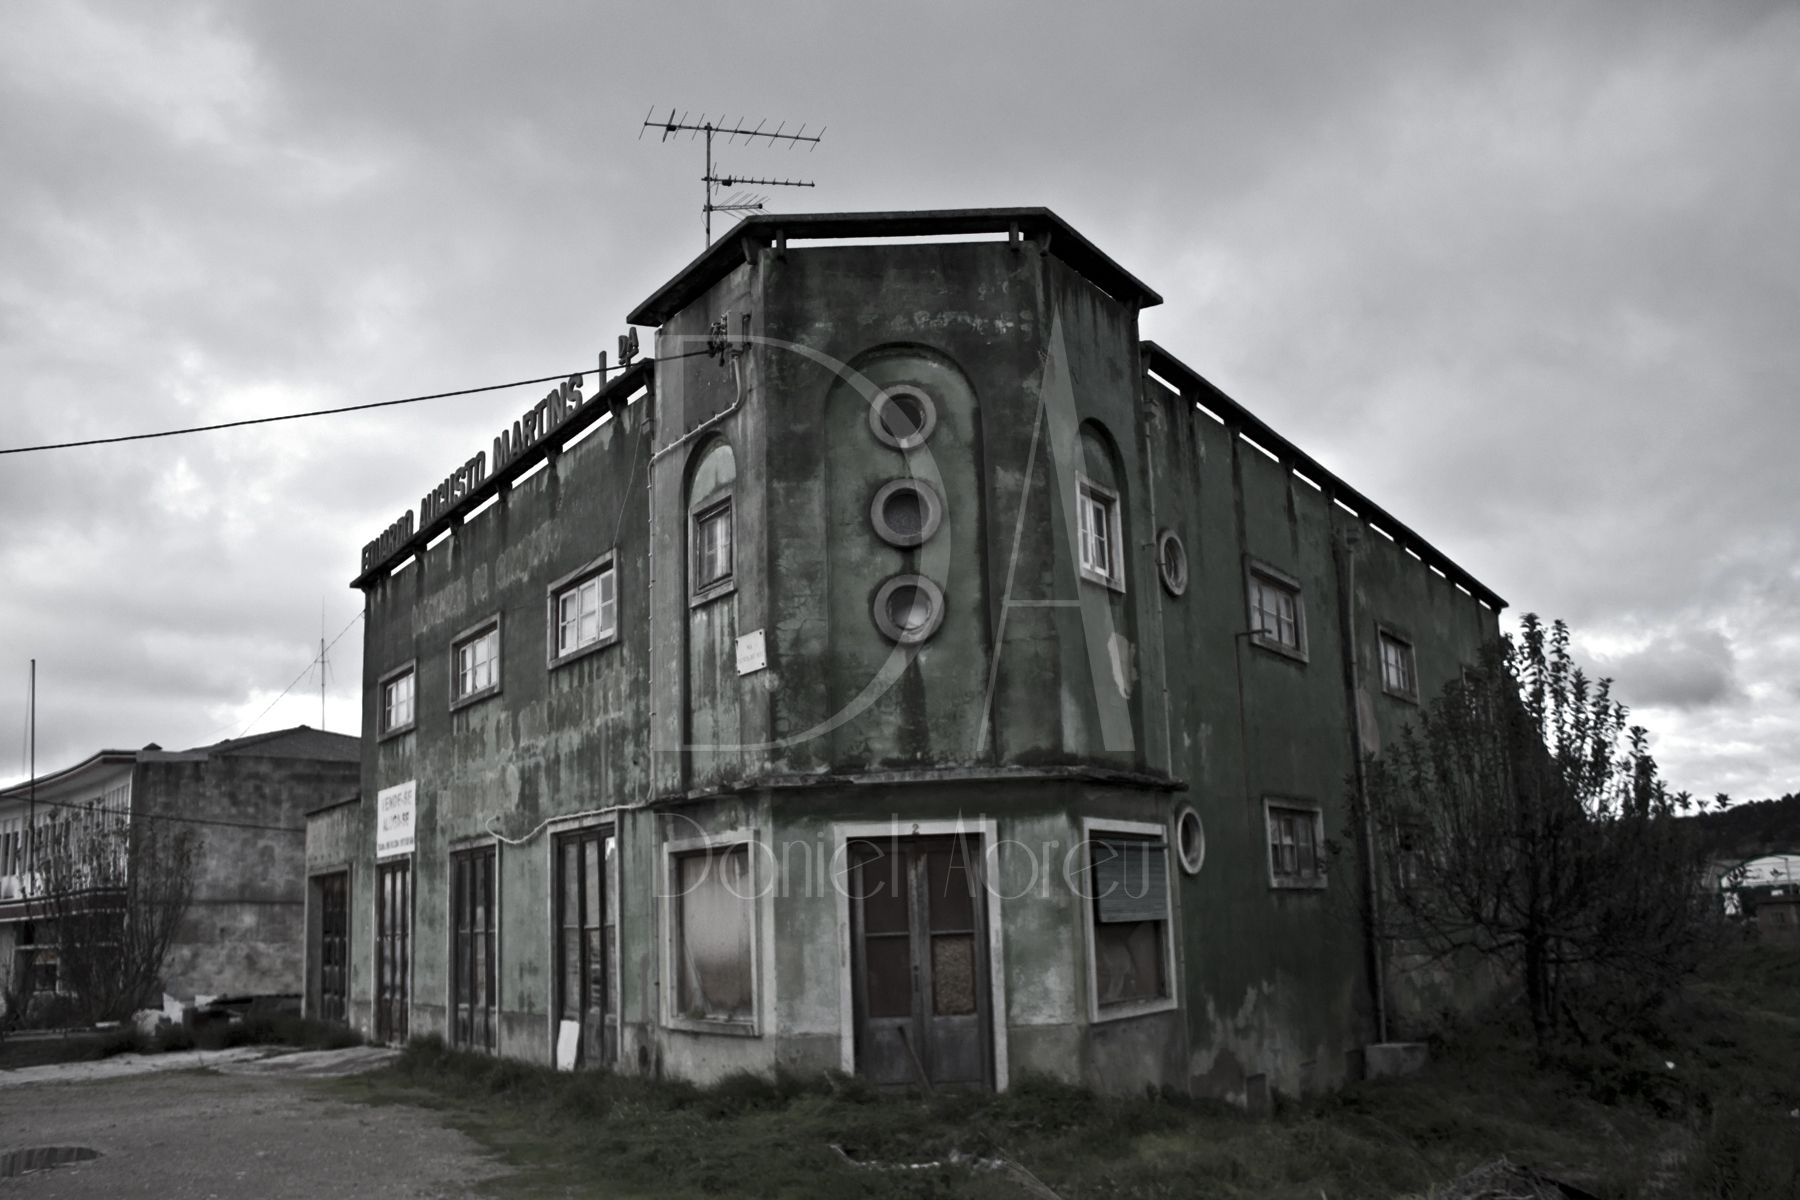 Abandoned Warehouse By Daniel Abreu On Deviantart